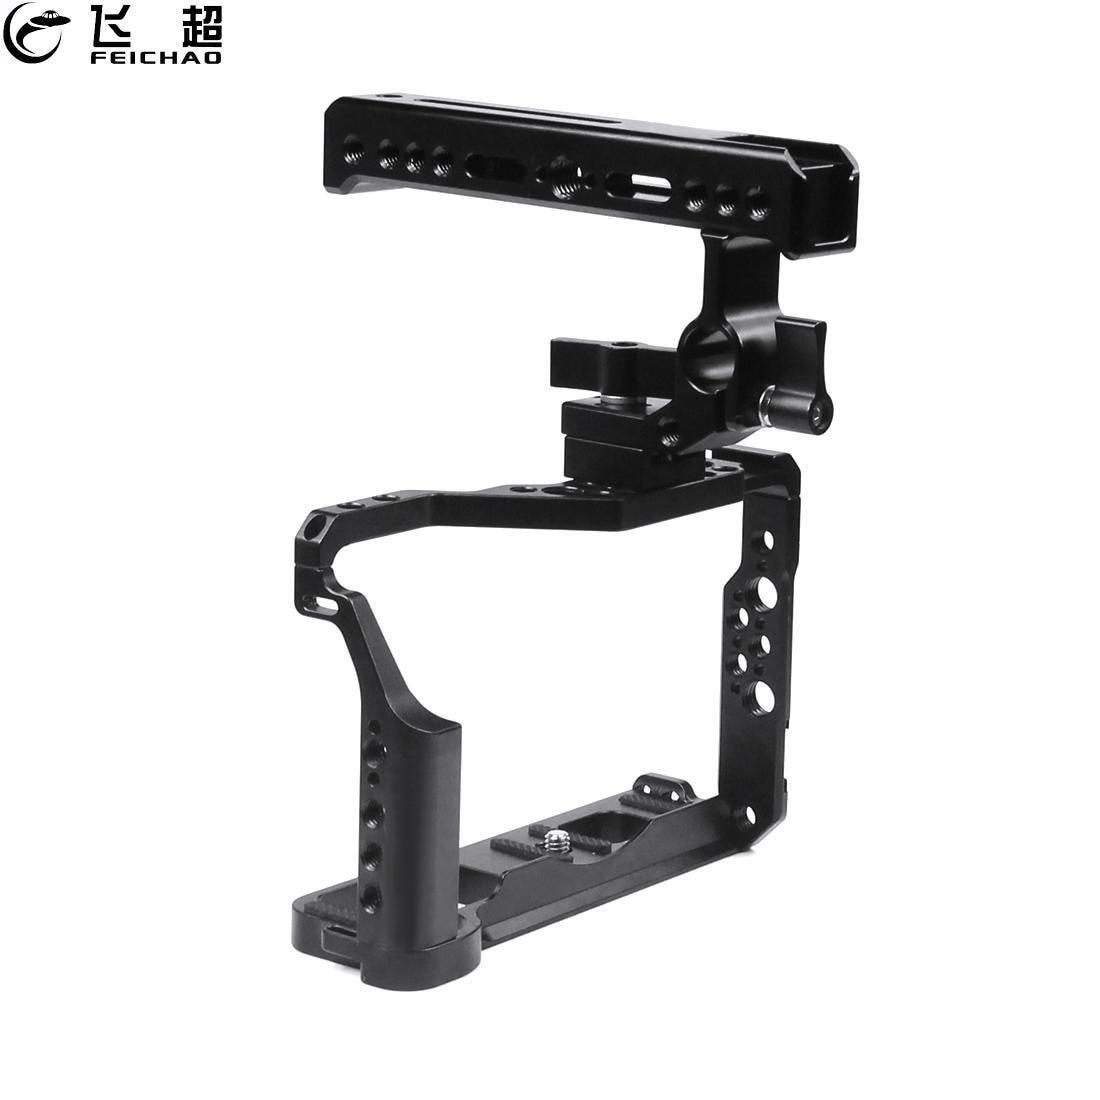 XT2 XT3 DSLR كاميرا قفص الأعلى مقبض استقرار تزوير ل فوجي فيلم X-T3 X-T2 DSLR واقية حالة ترايبود Ballhead Vlog اكسسوارات